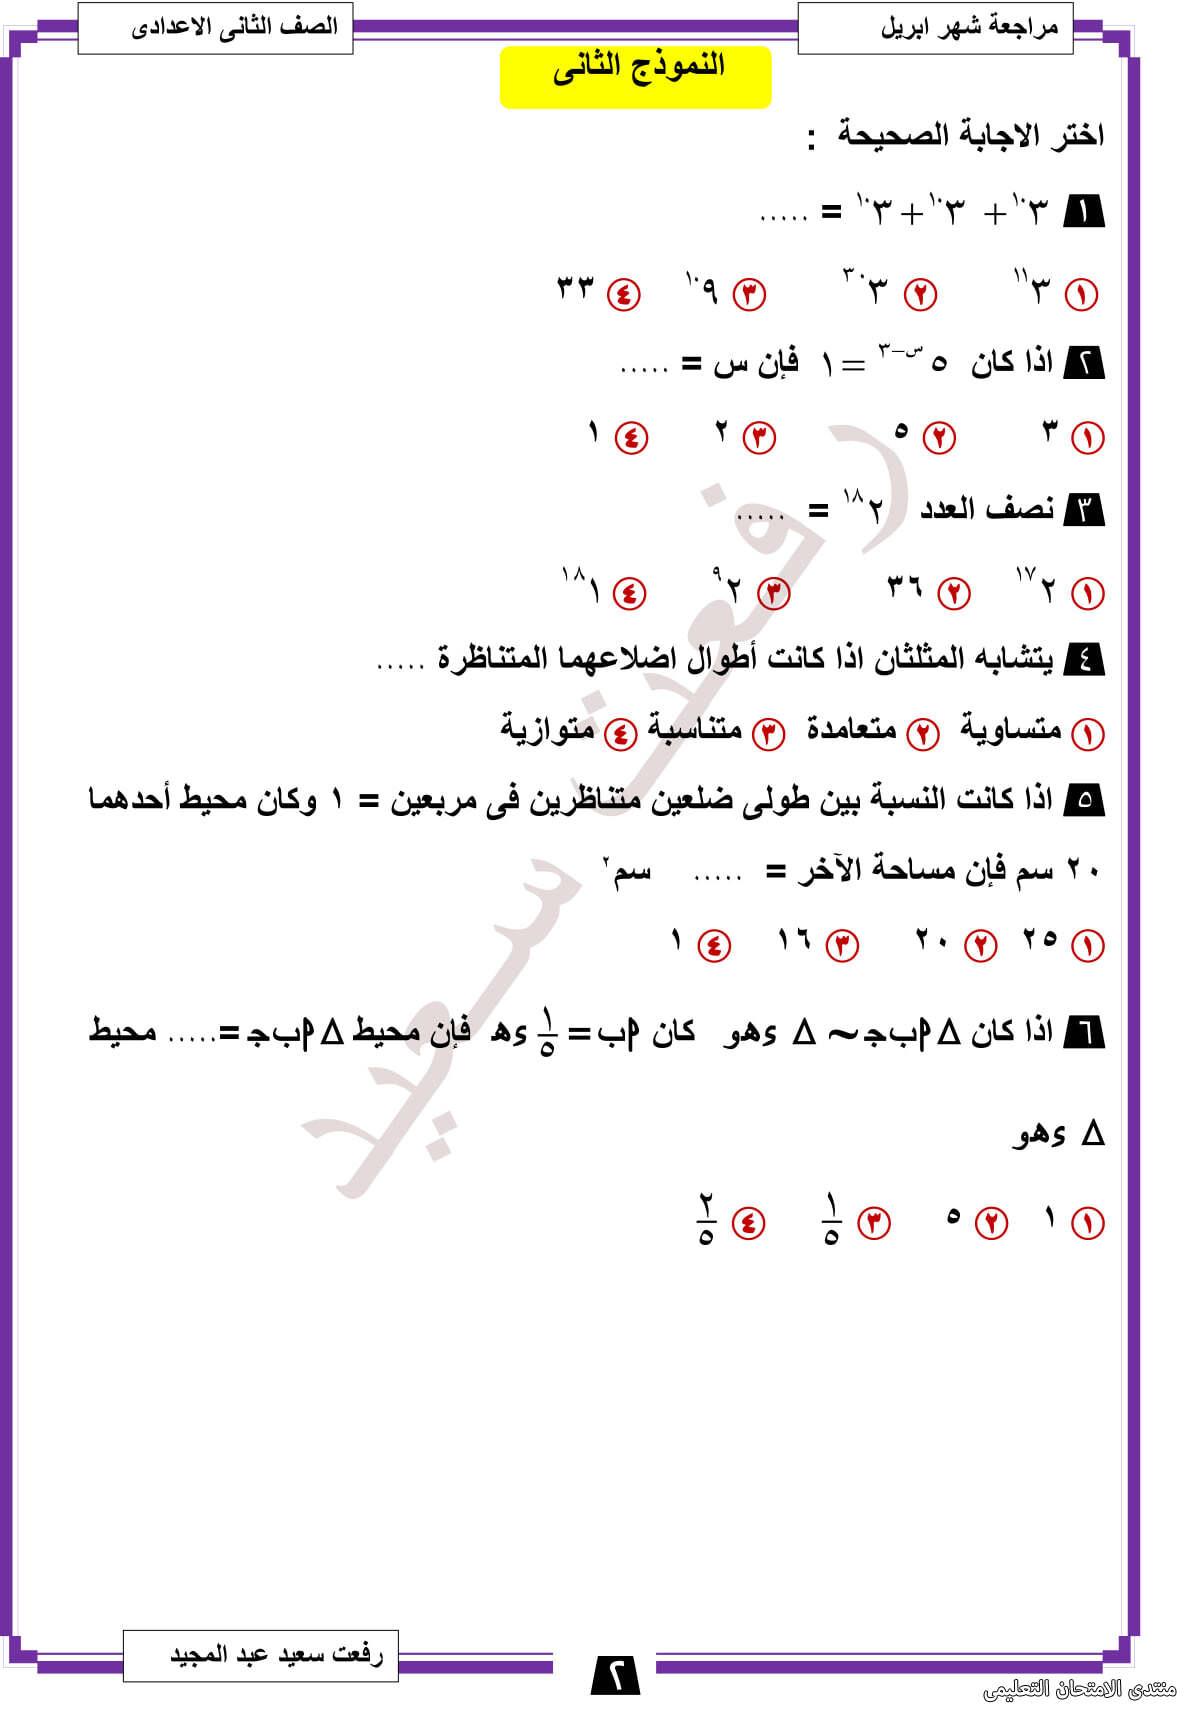 exam-eg.com_161904908745152.jpg